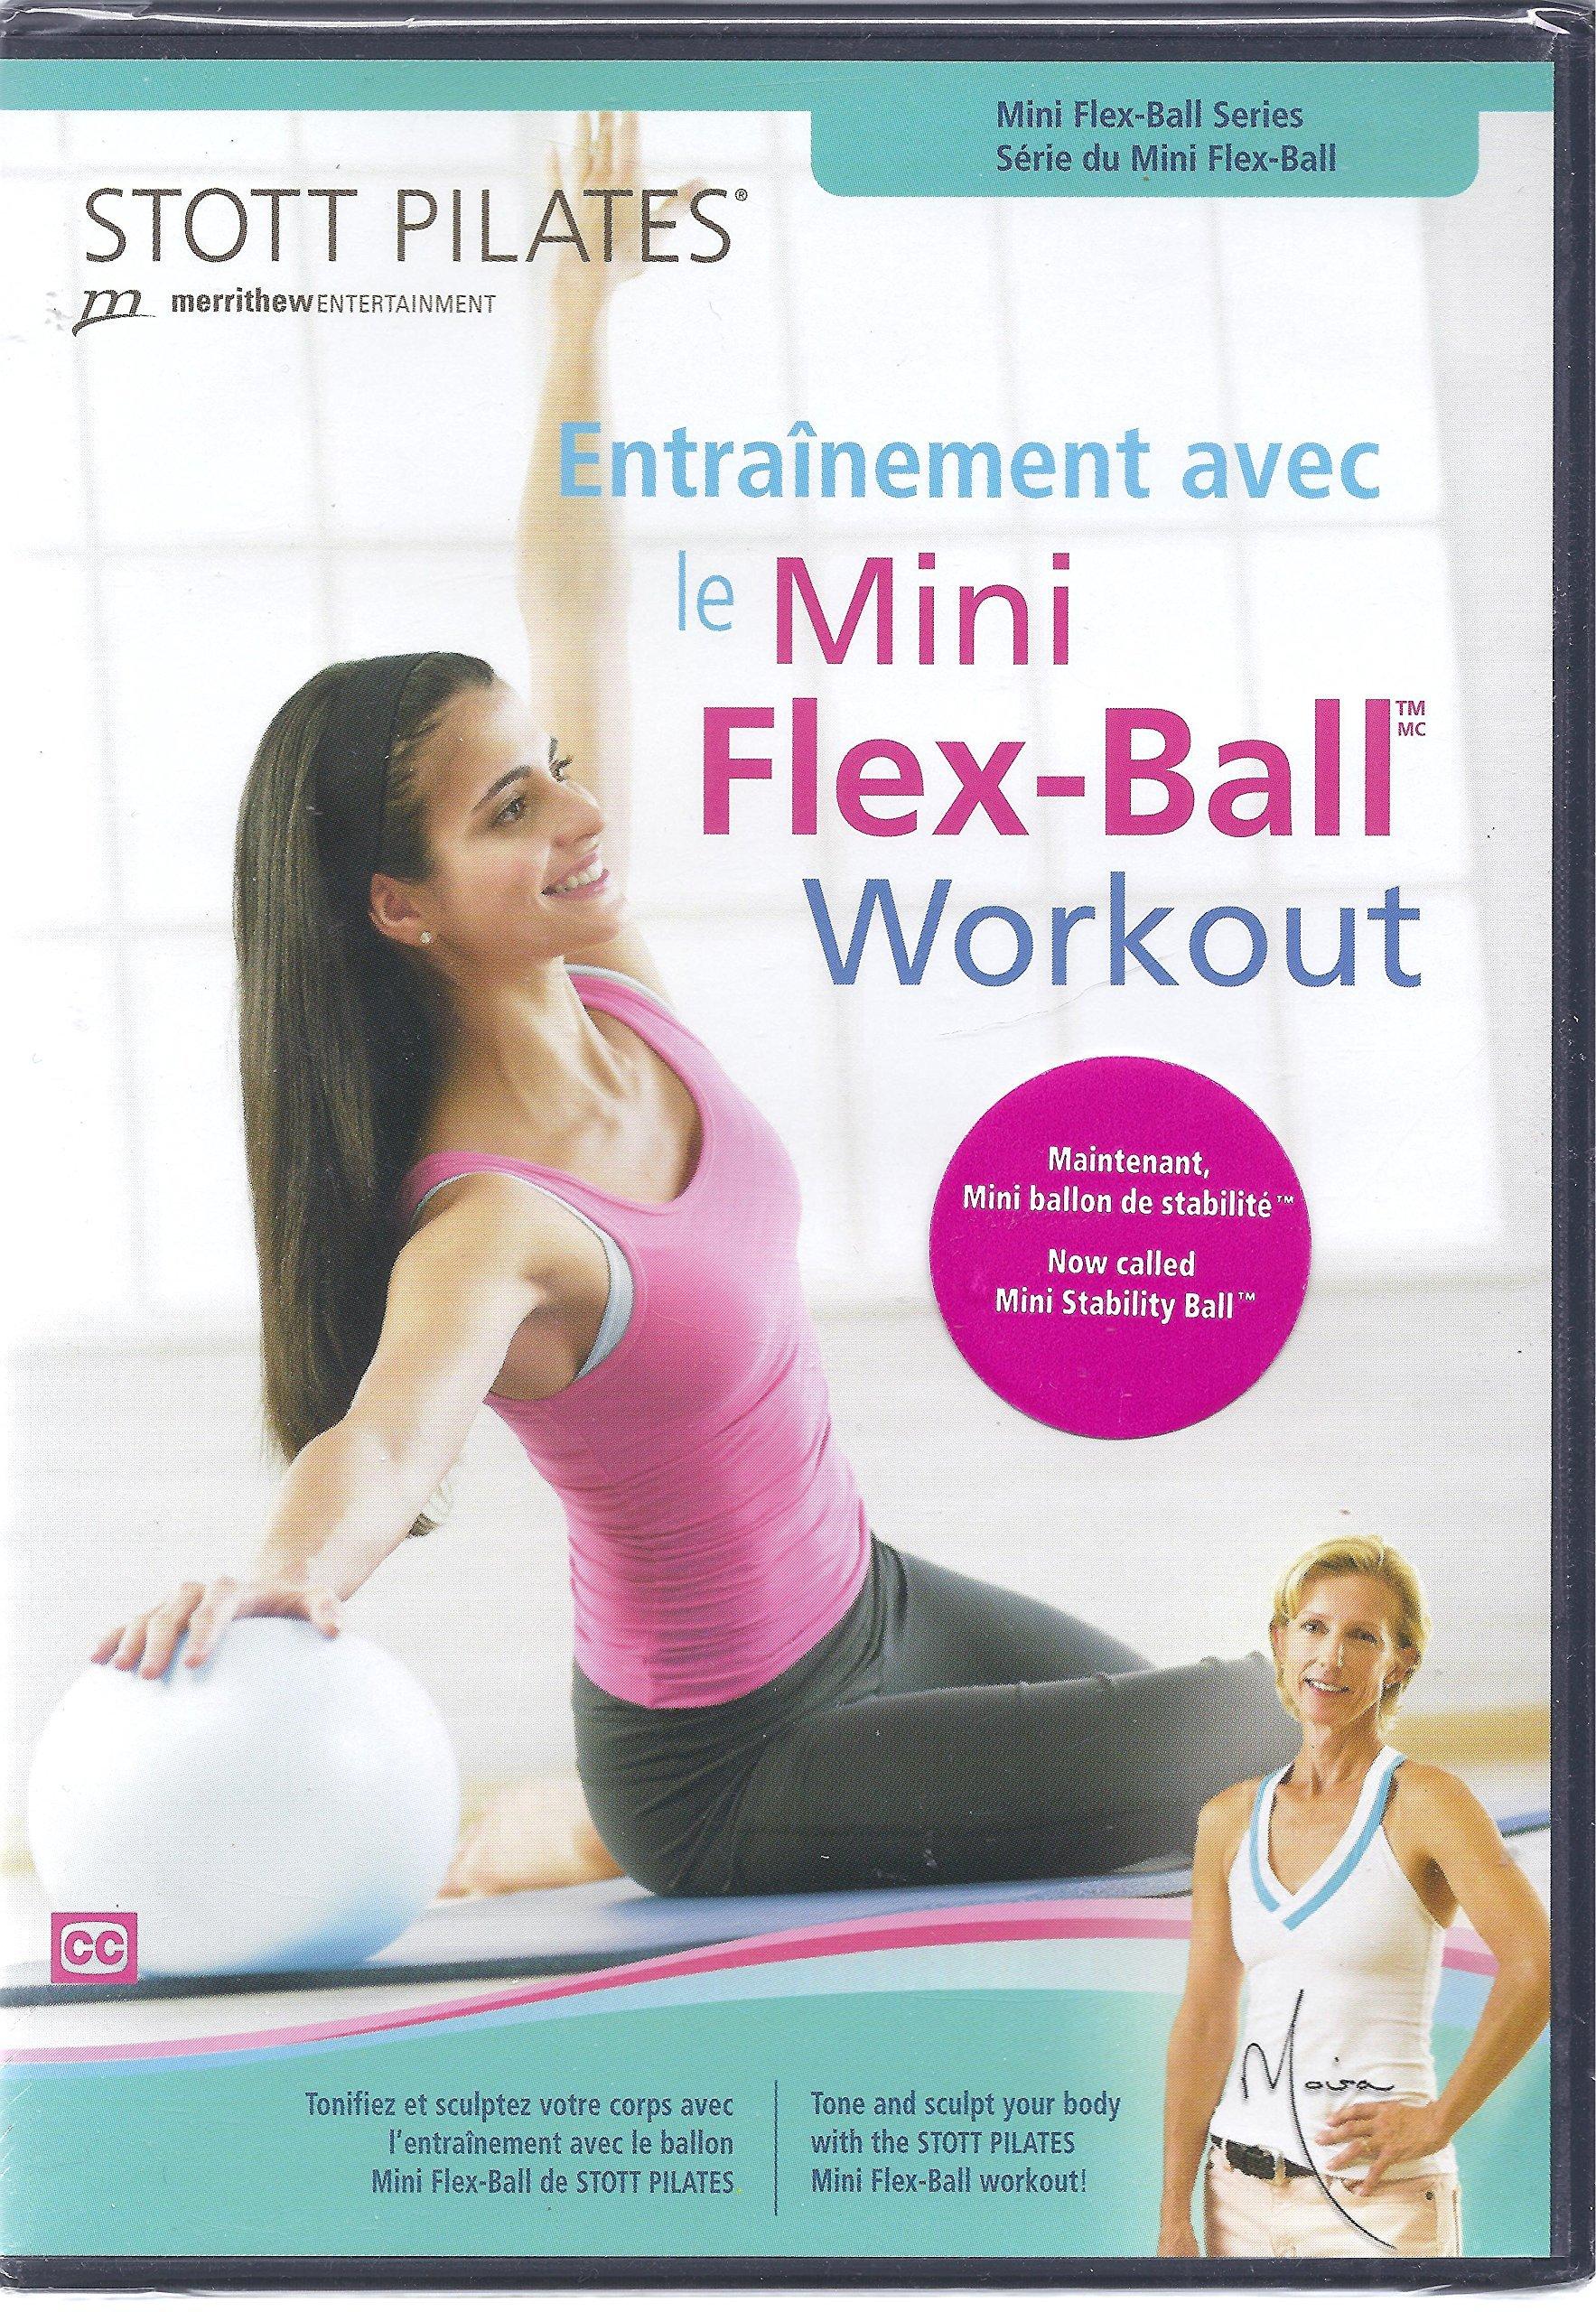 STOTT PILATES Mini Stability Ball Workout